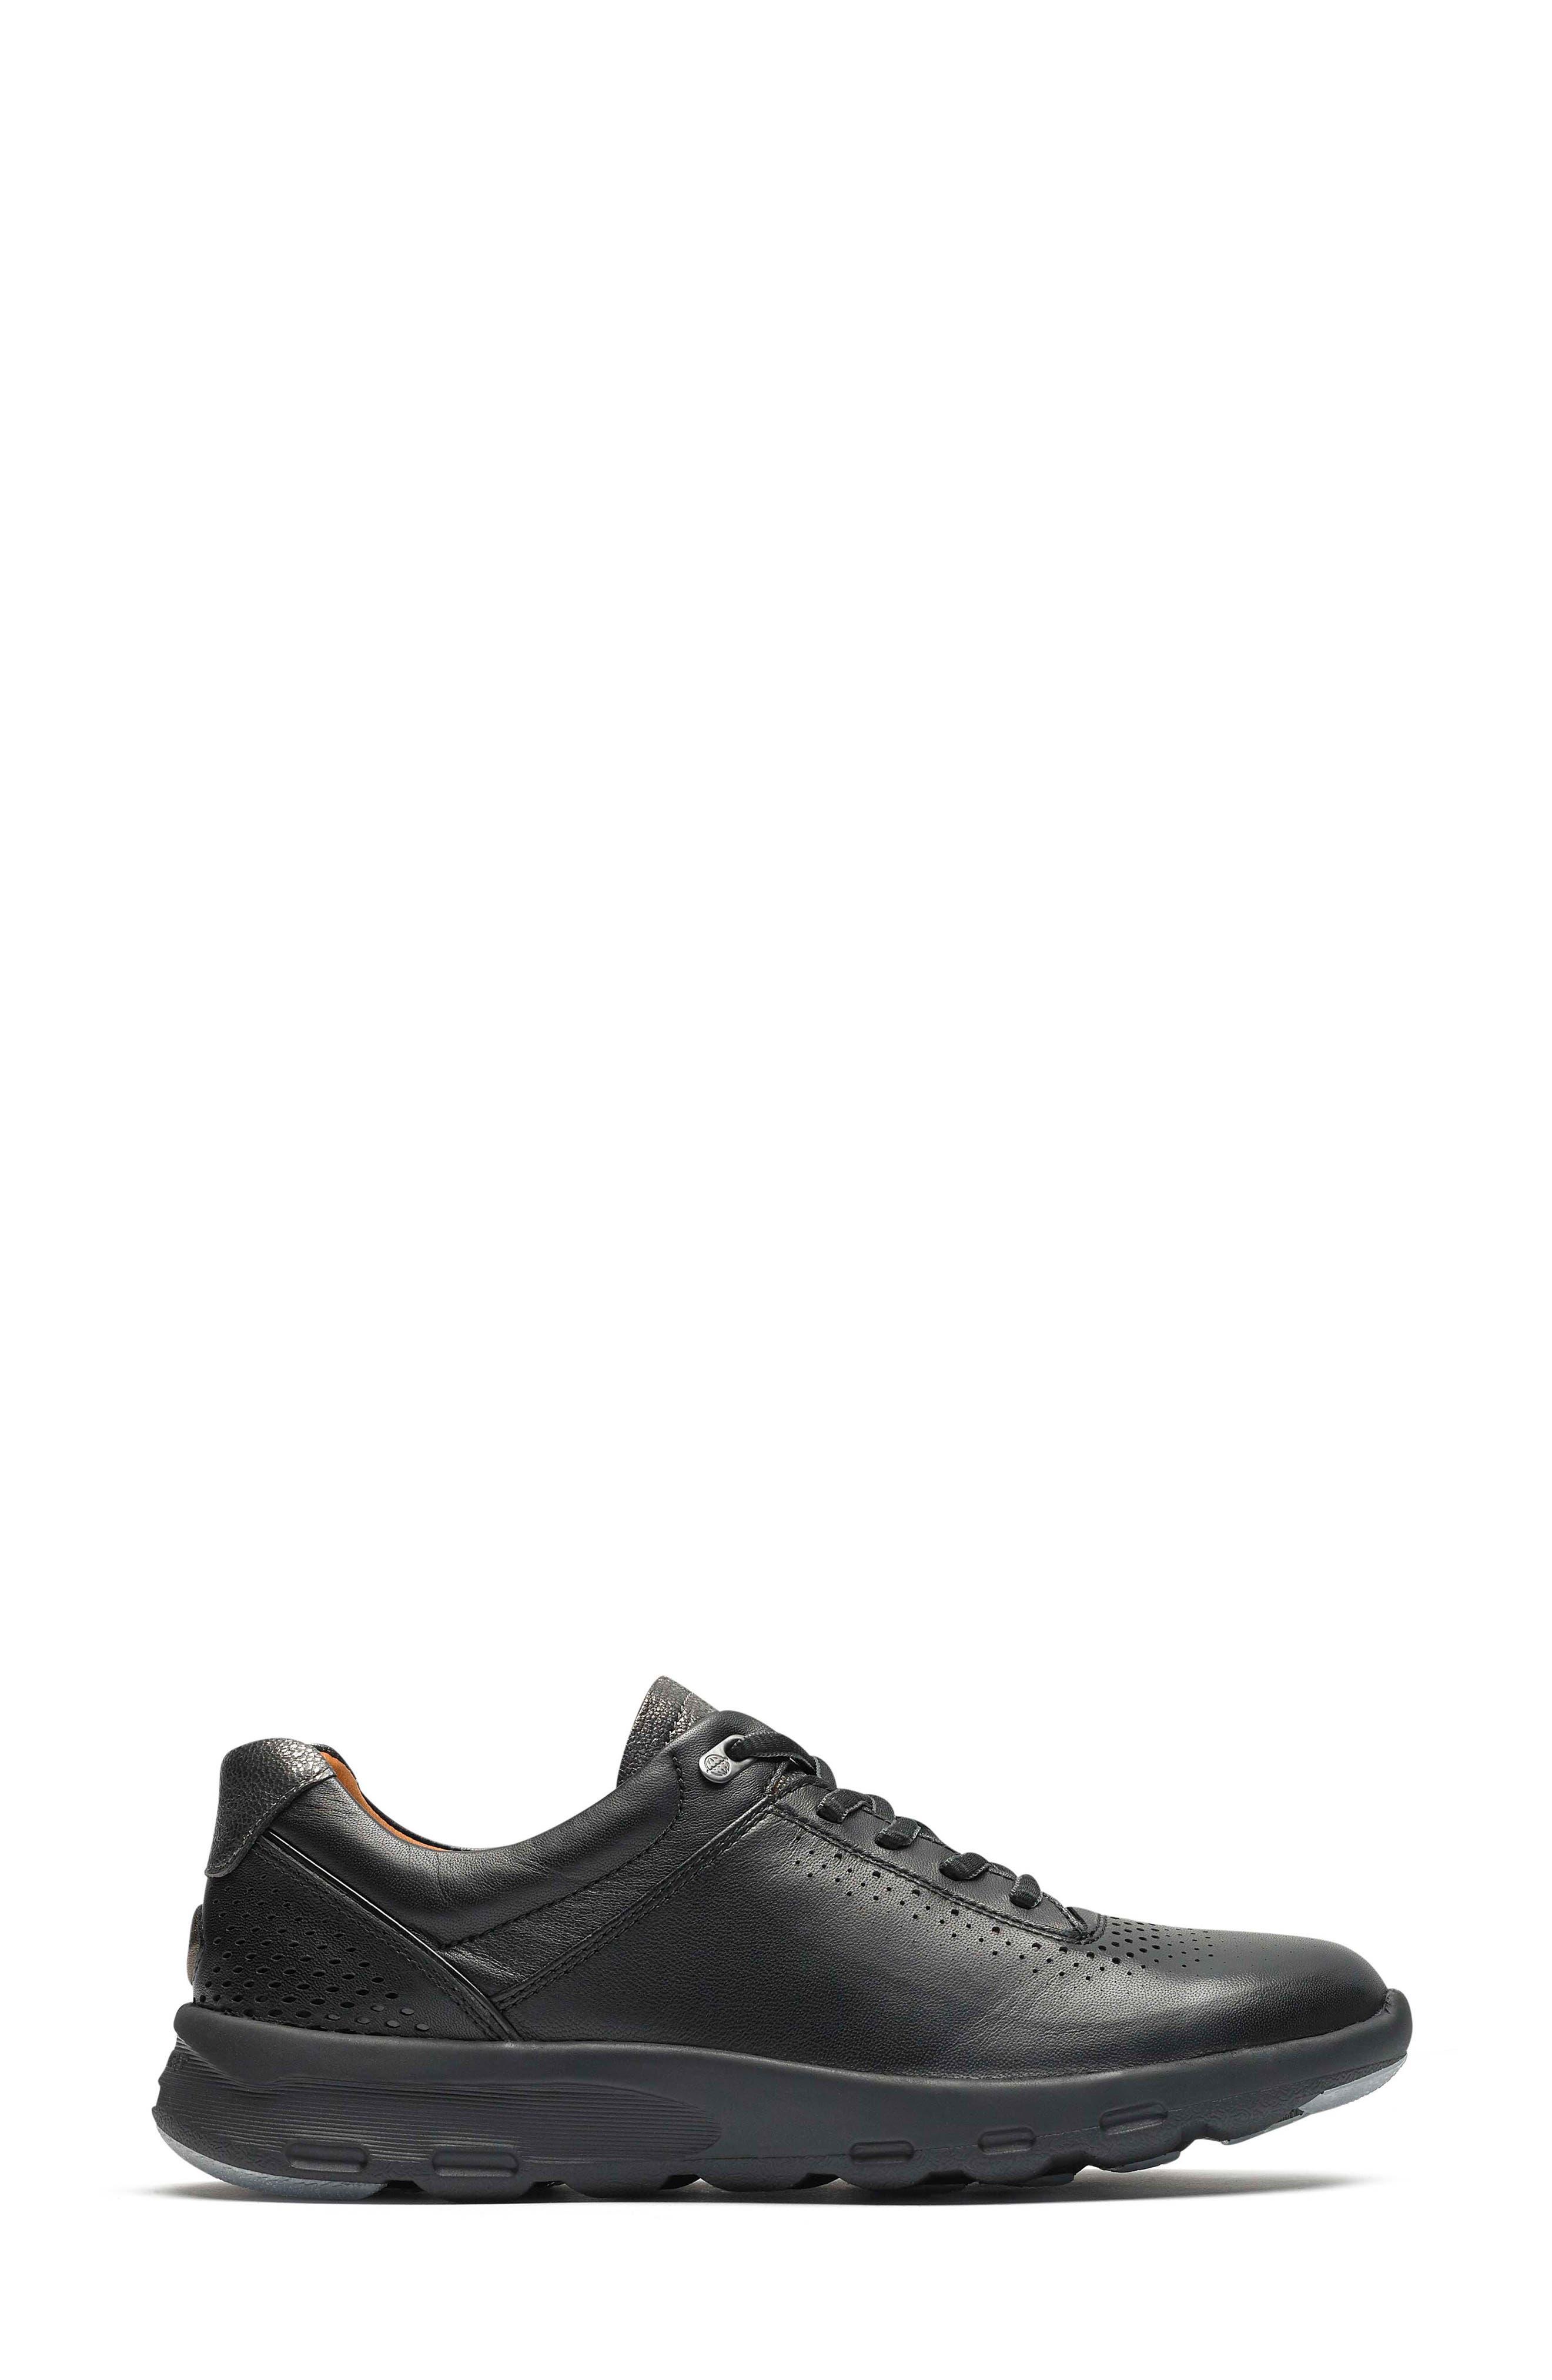 ROCKPORT,                             Let's Walk<sup>®</sup> Ubal Sneaker,                             Alternate thumbnail 3, color,                             BLACK/ BLACK LEATHER